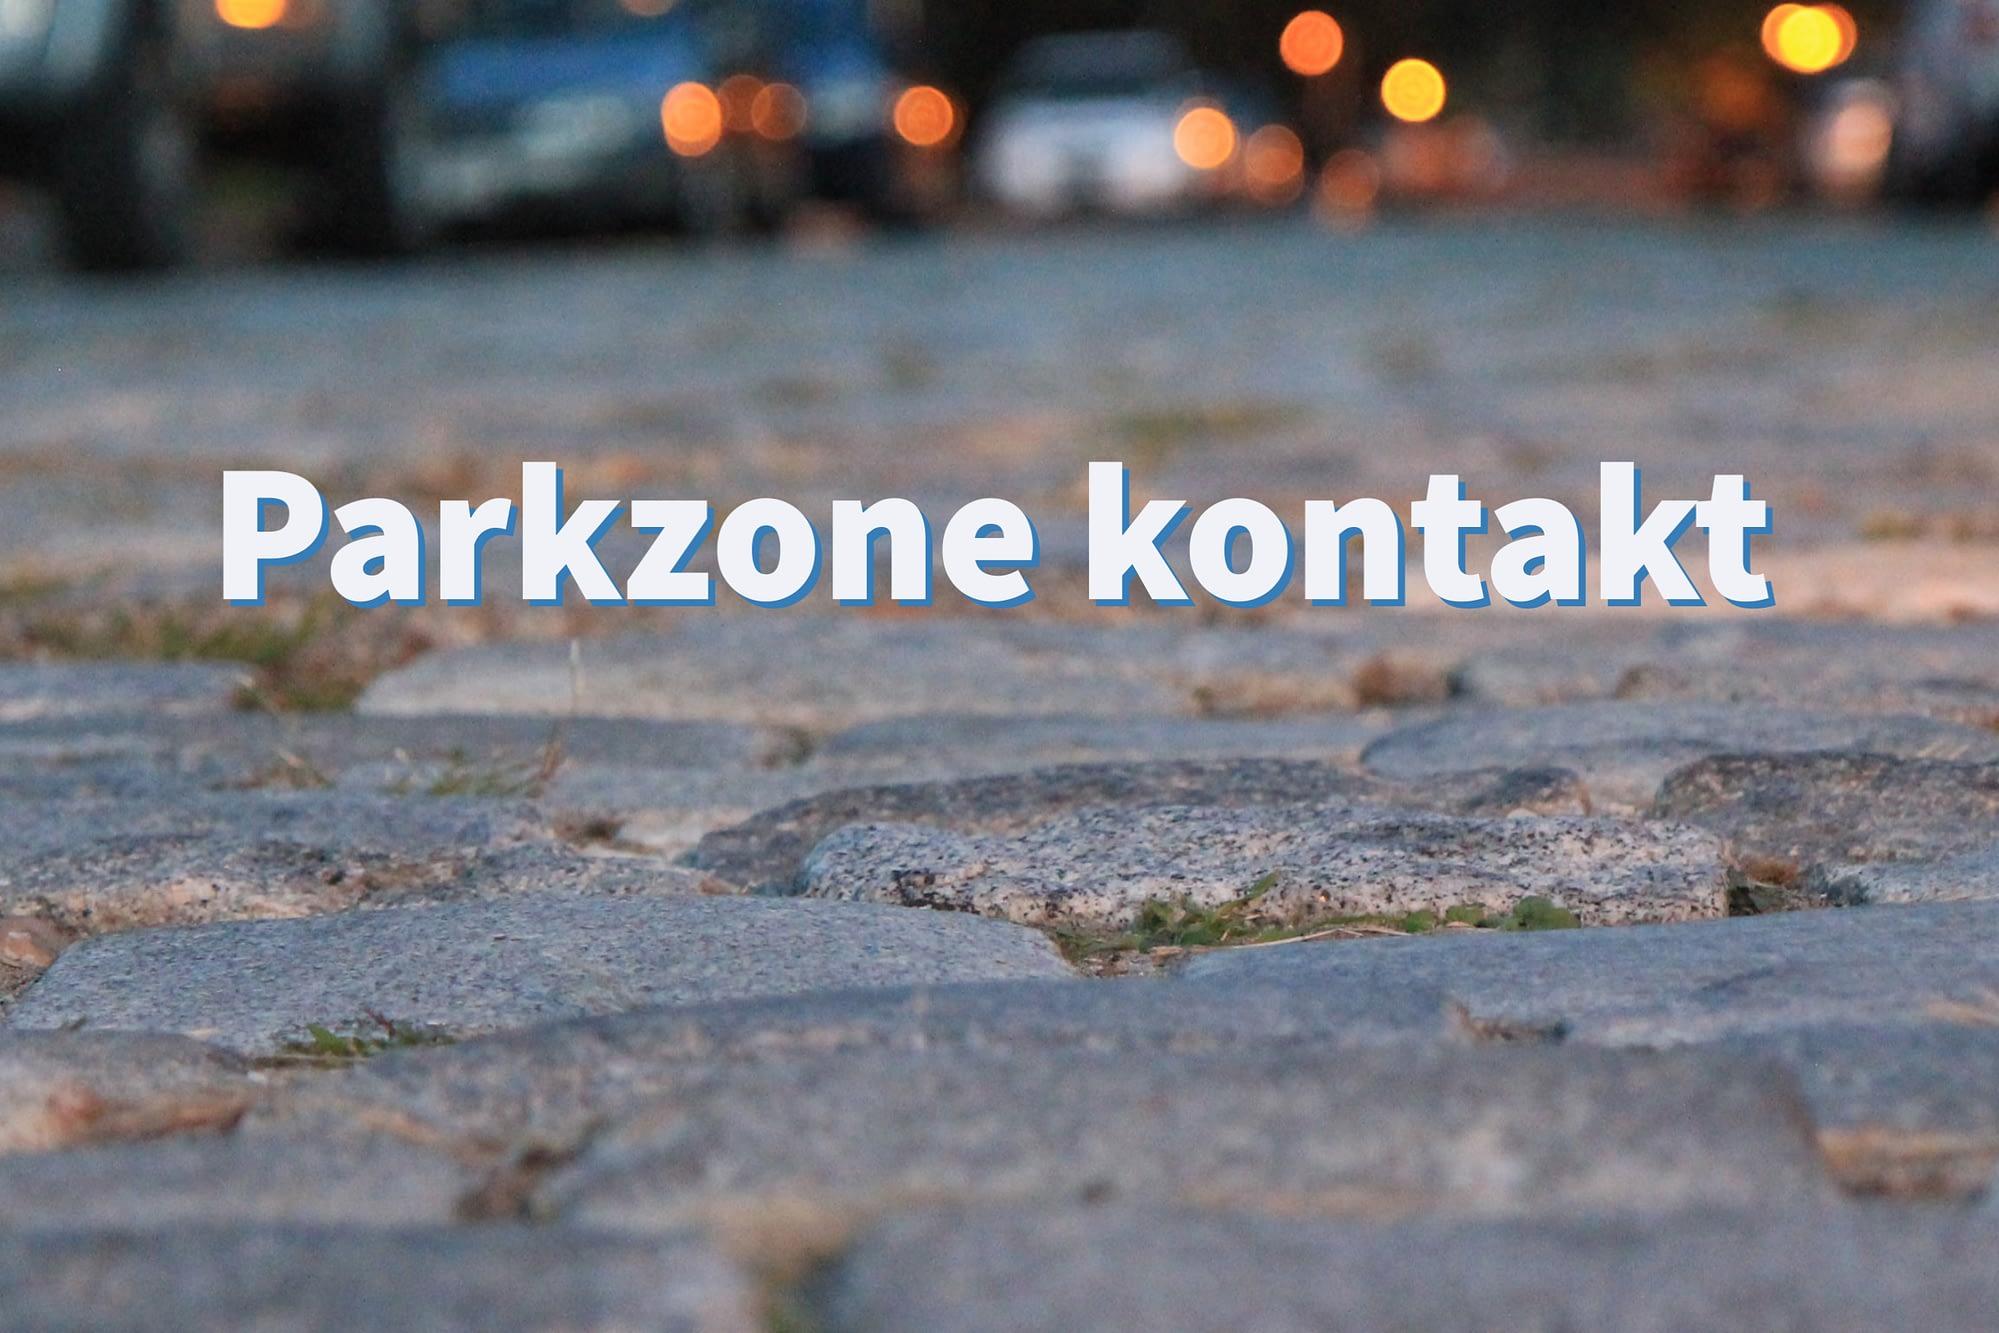 Parkzone kontakt